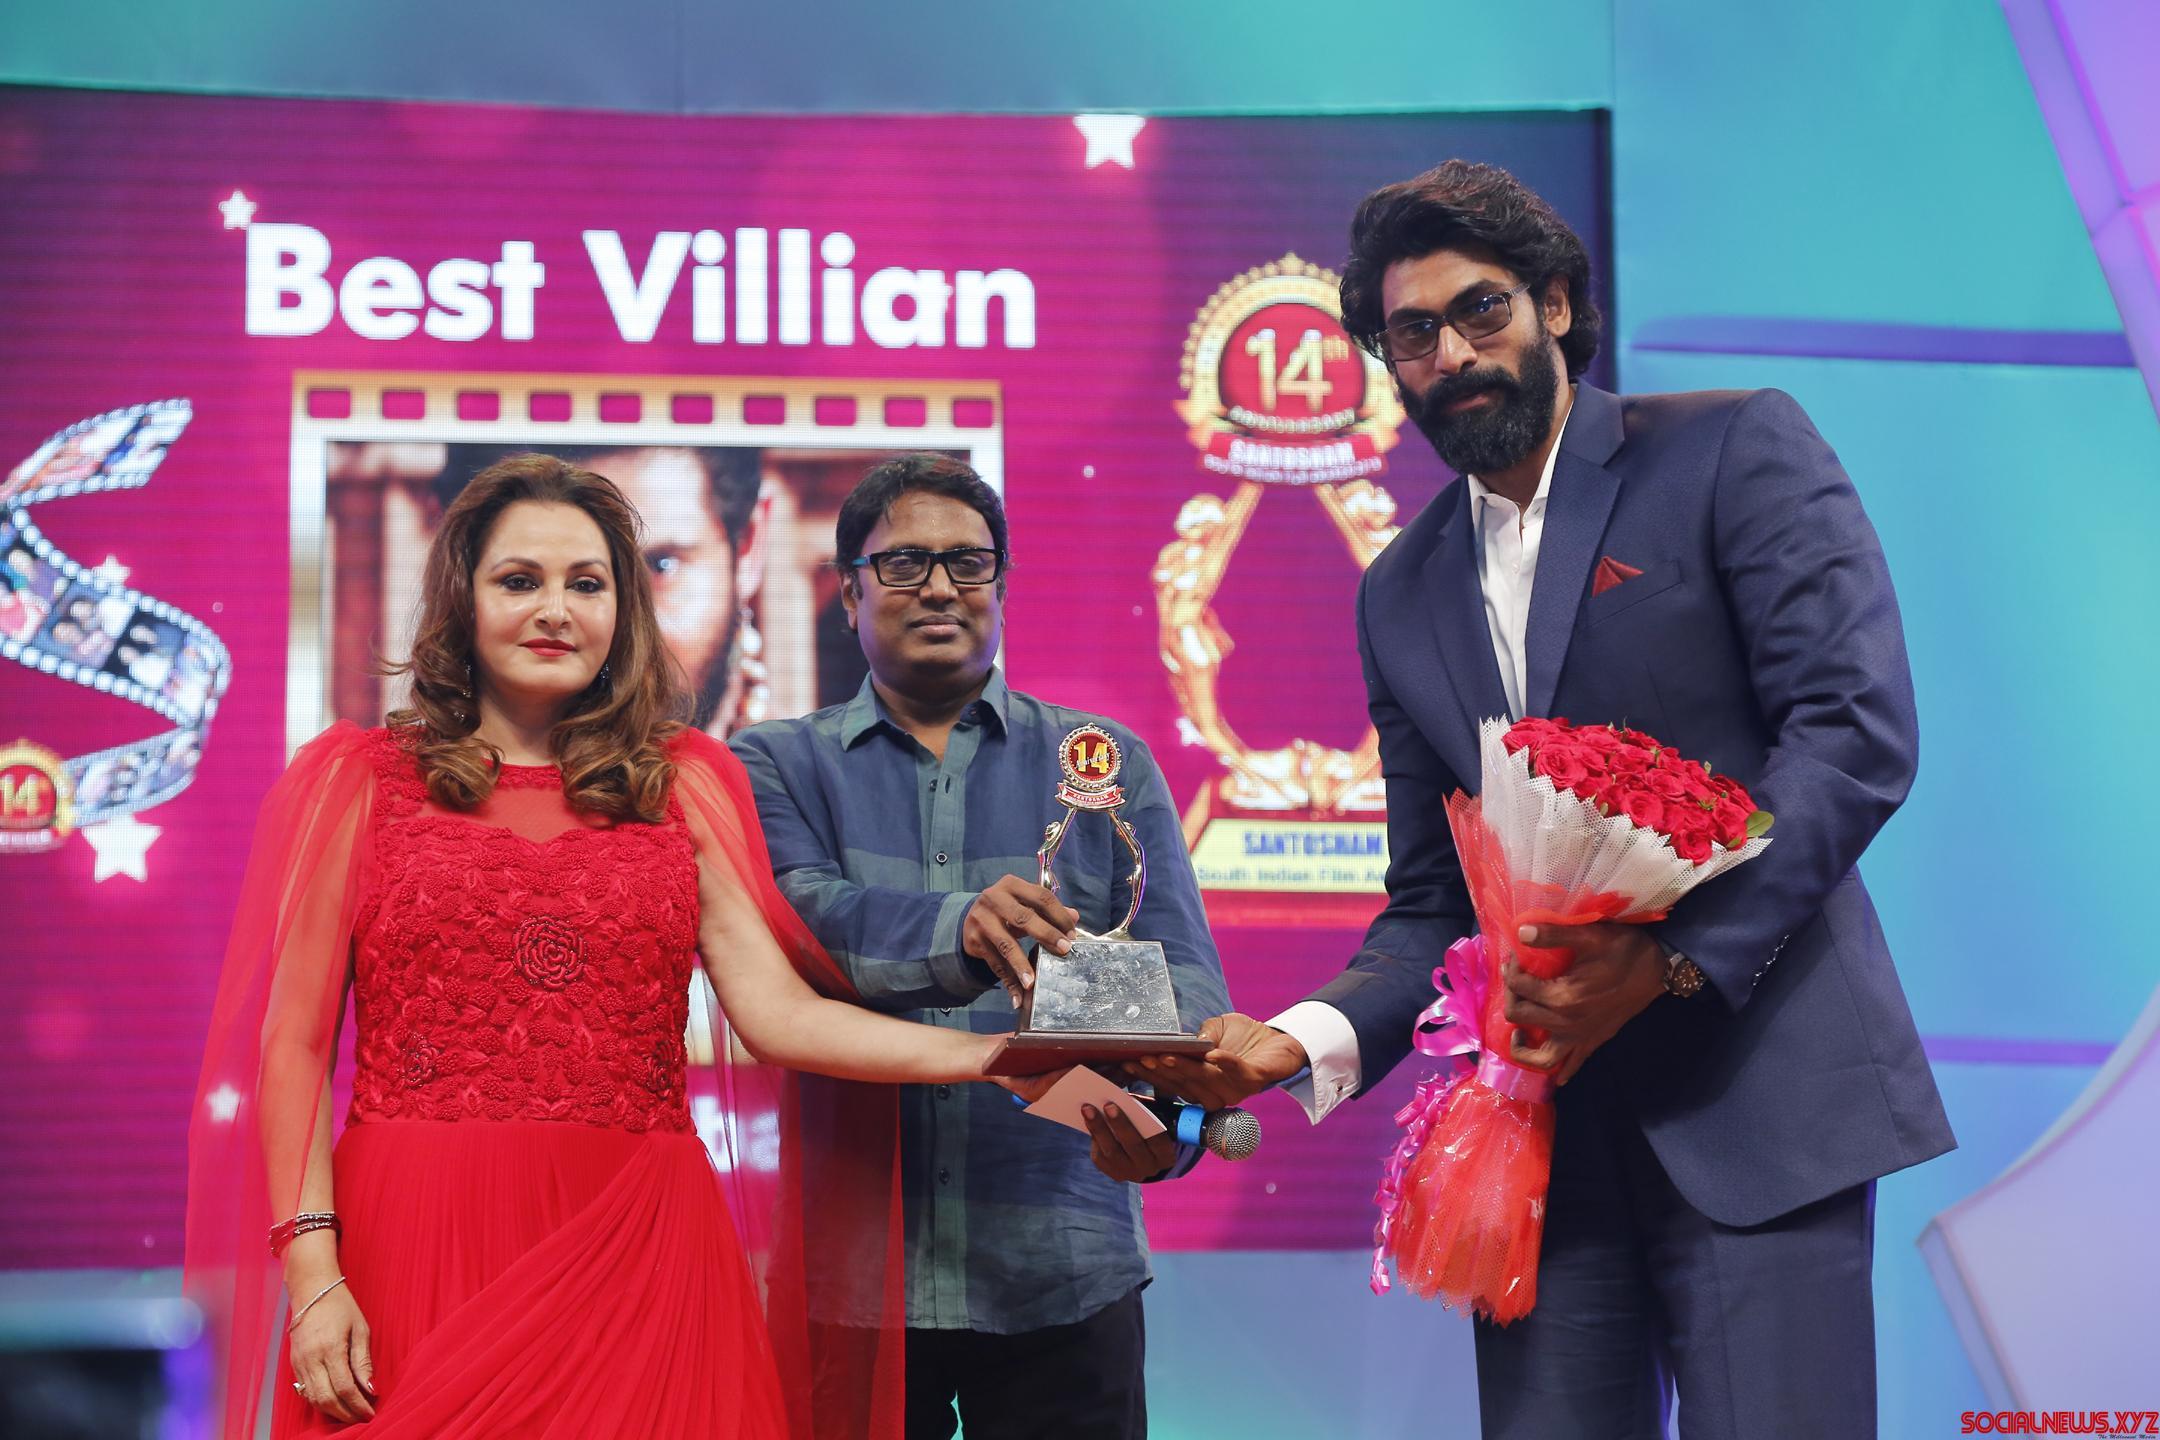 Santosham South India Film awards 2016 announced